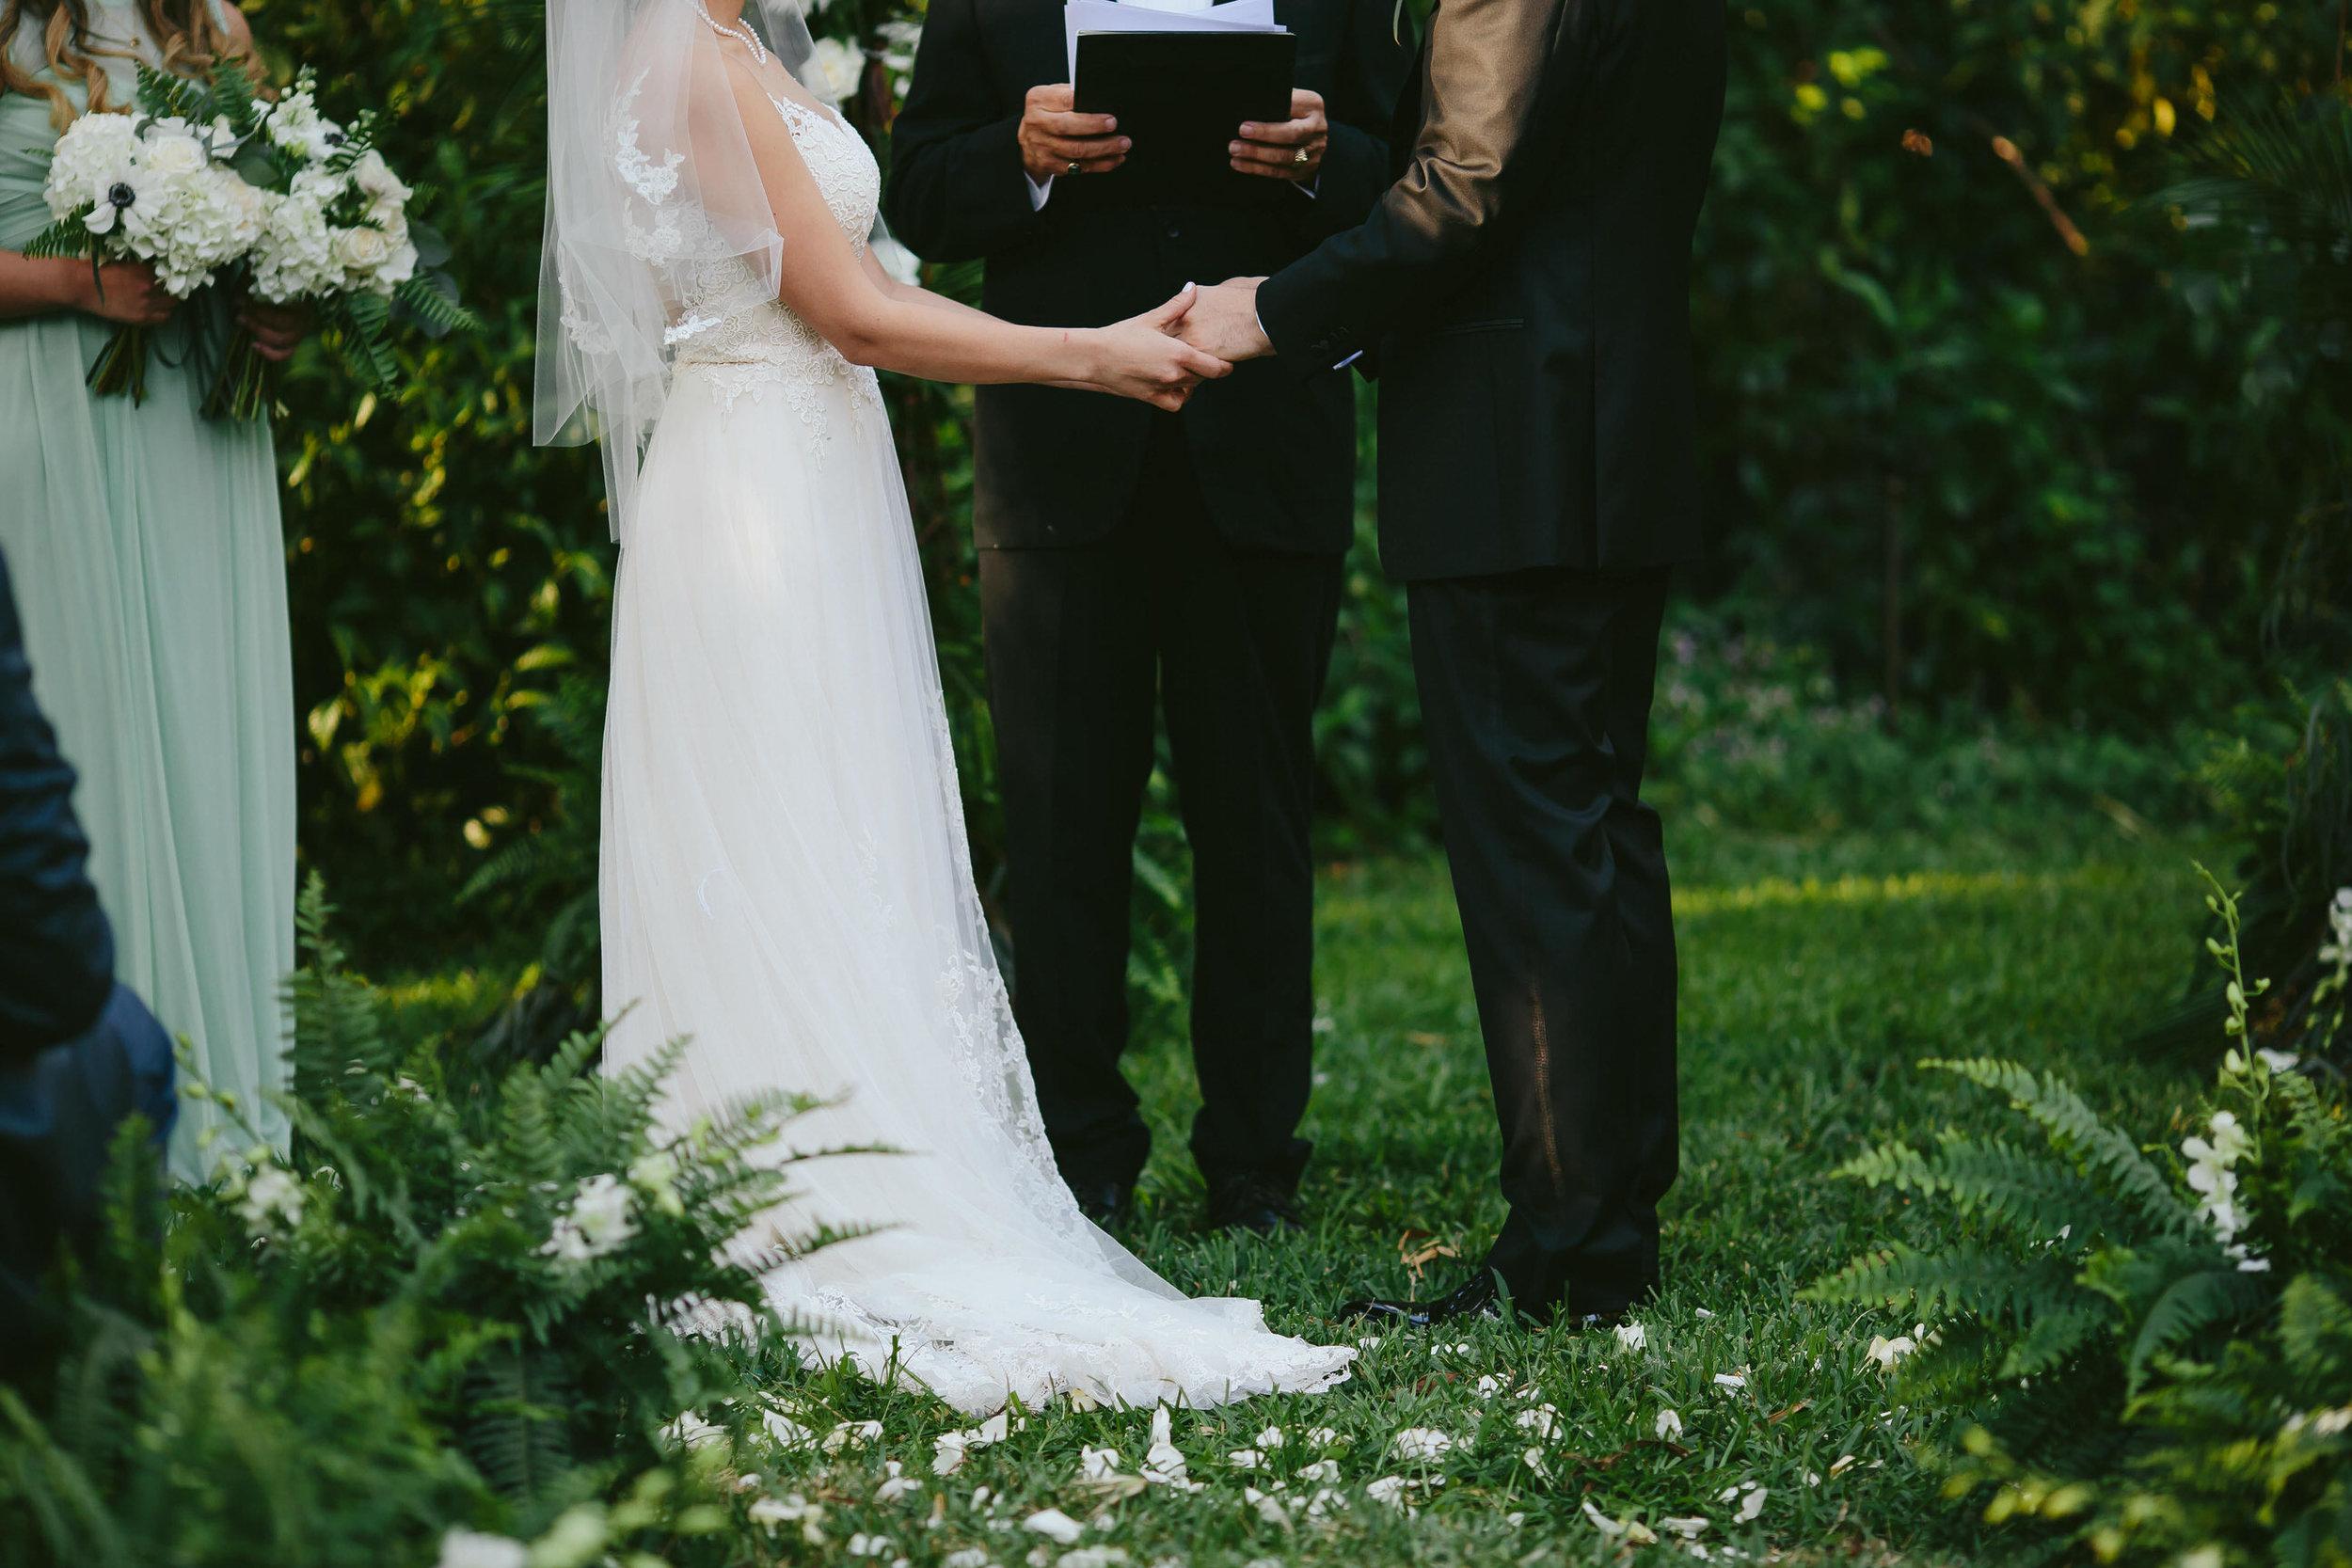 gorgeous_backyard_wedding_tiny_house_photo_twilight_inspired.jpg